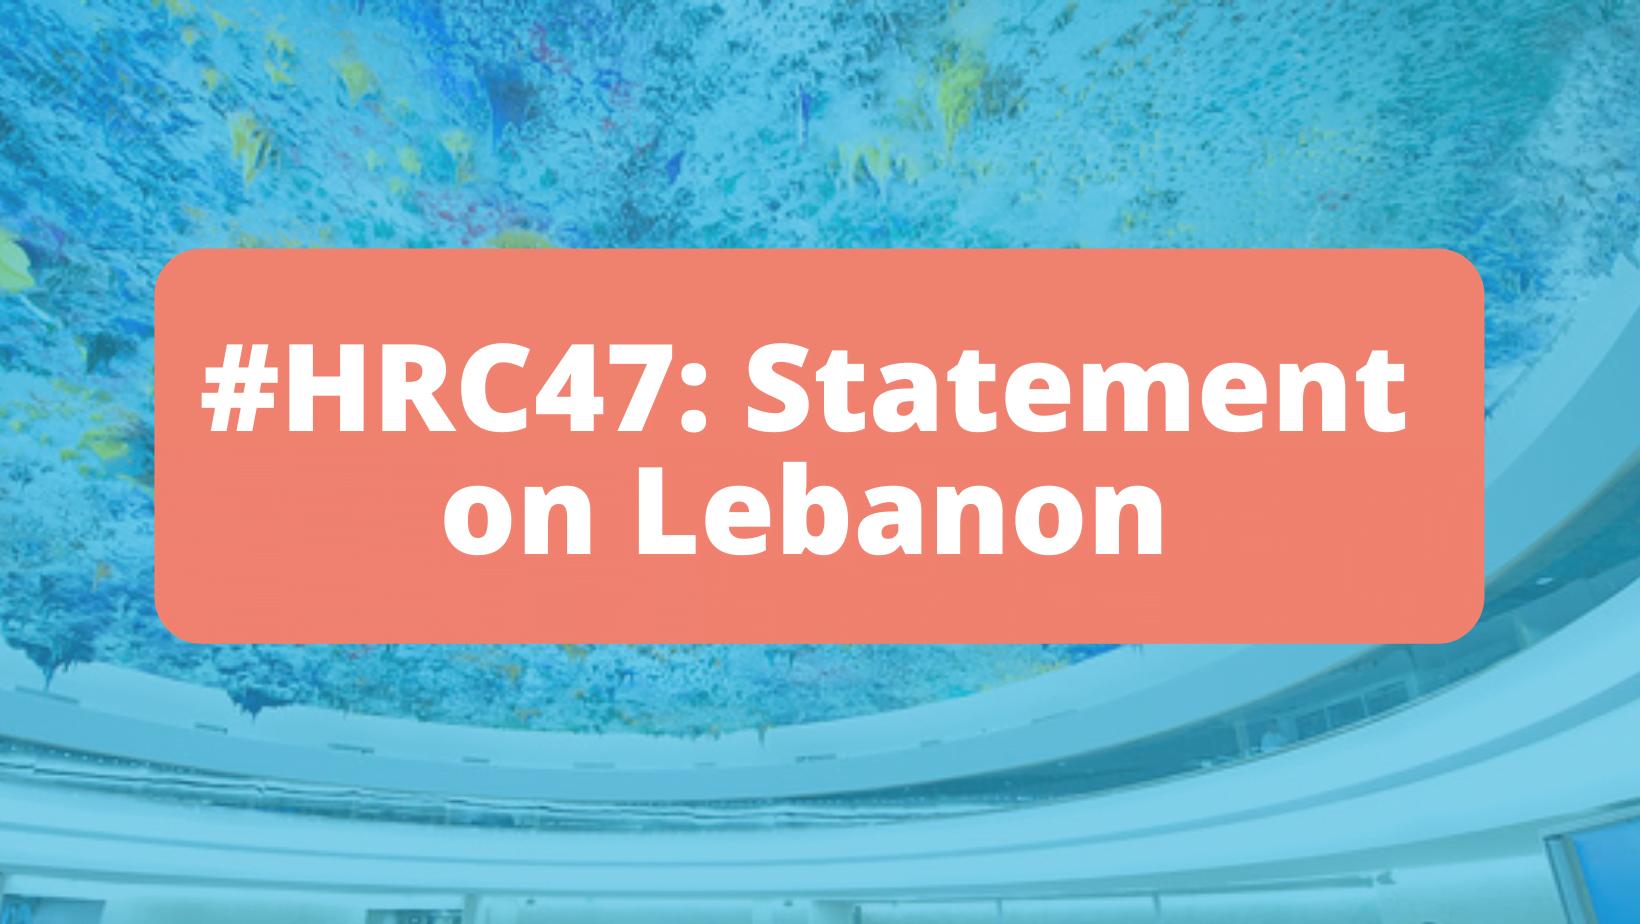 HRC47: Statement on Lebanon